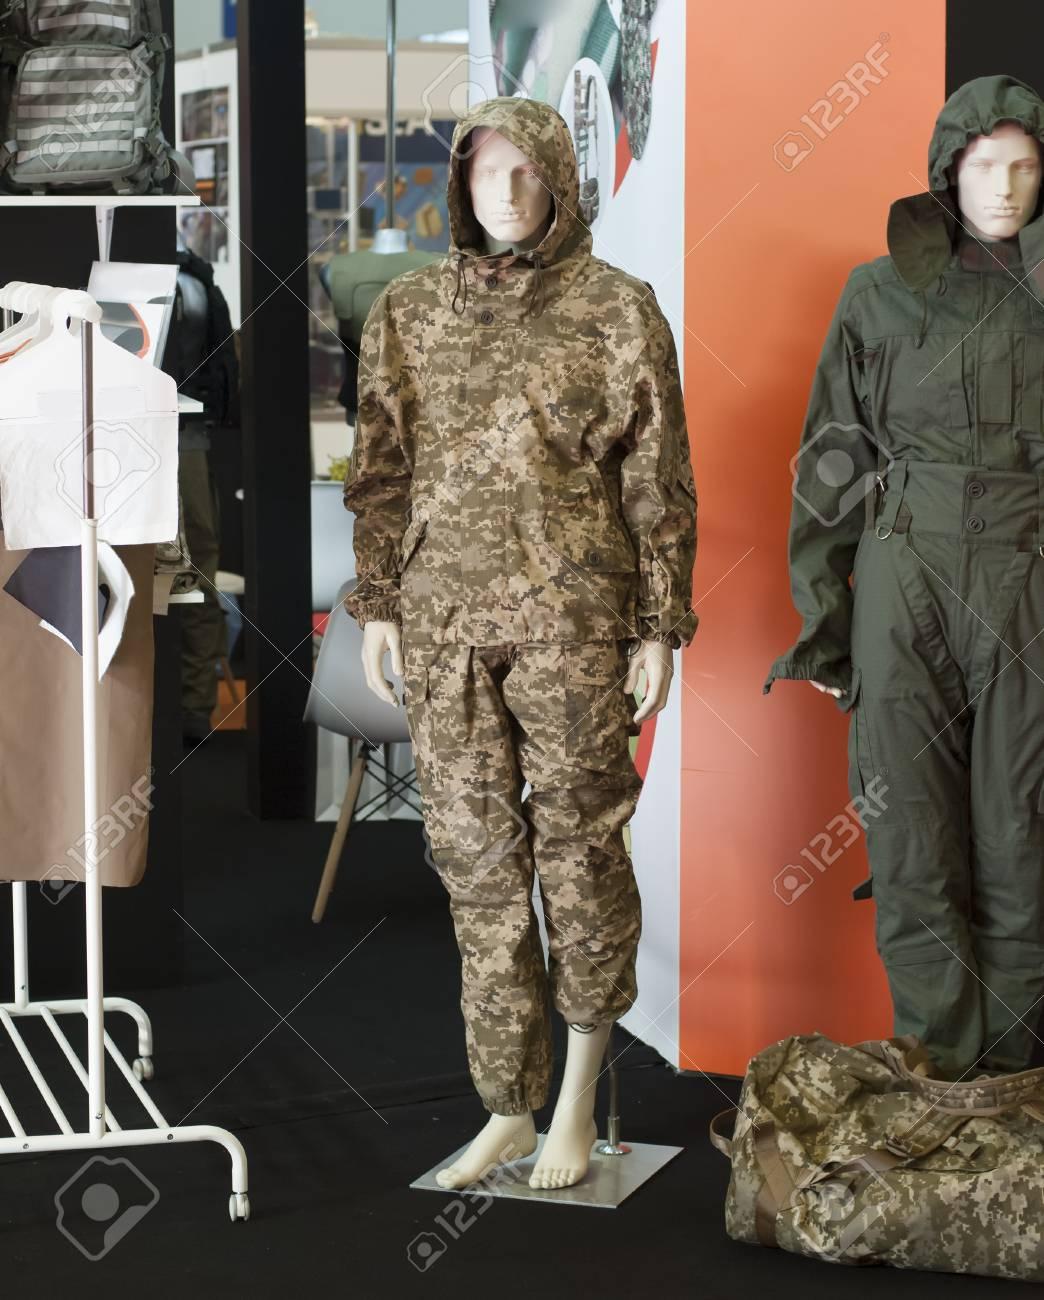 ukrainian soldier military uniform dressed on mannequin - 116150405